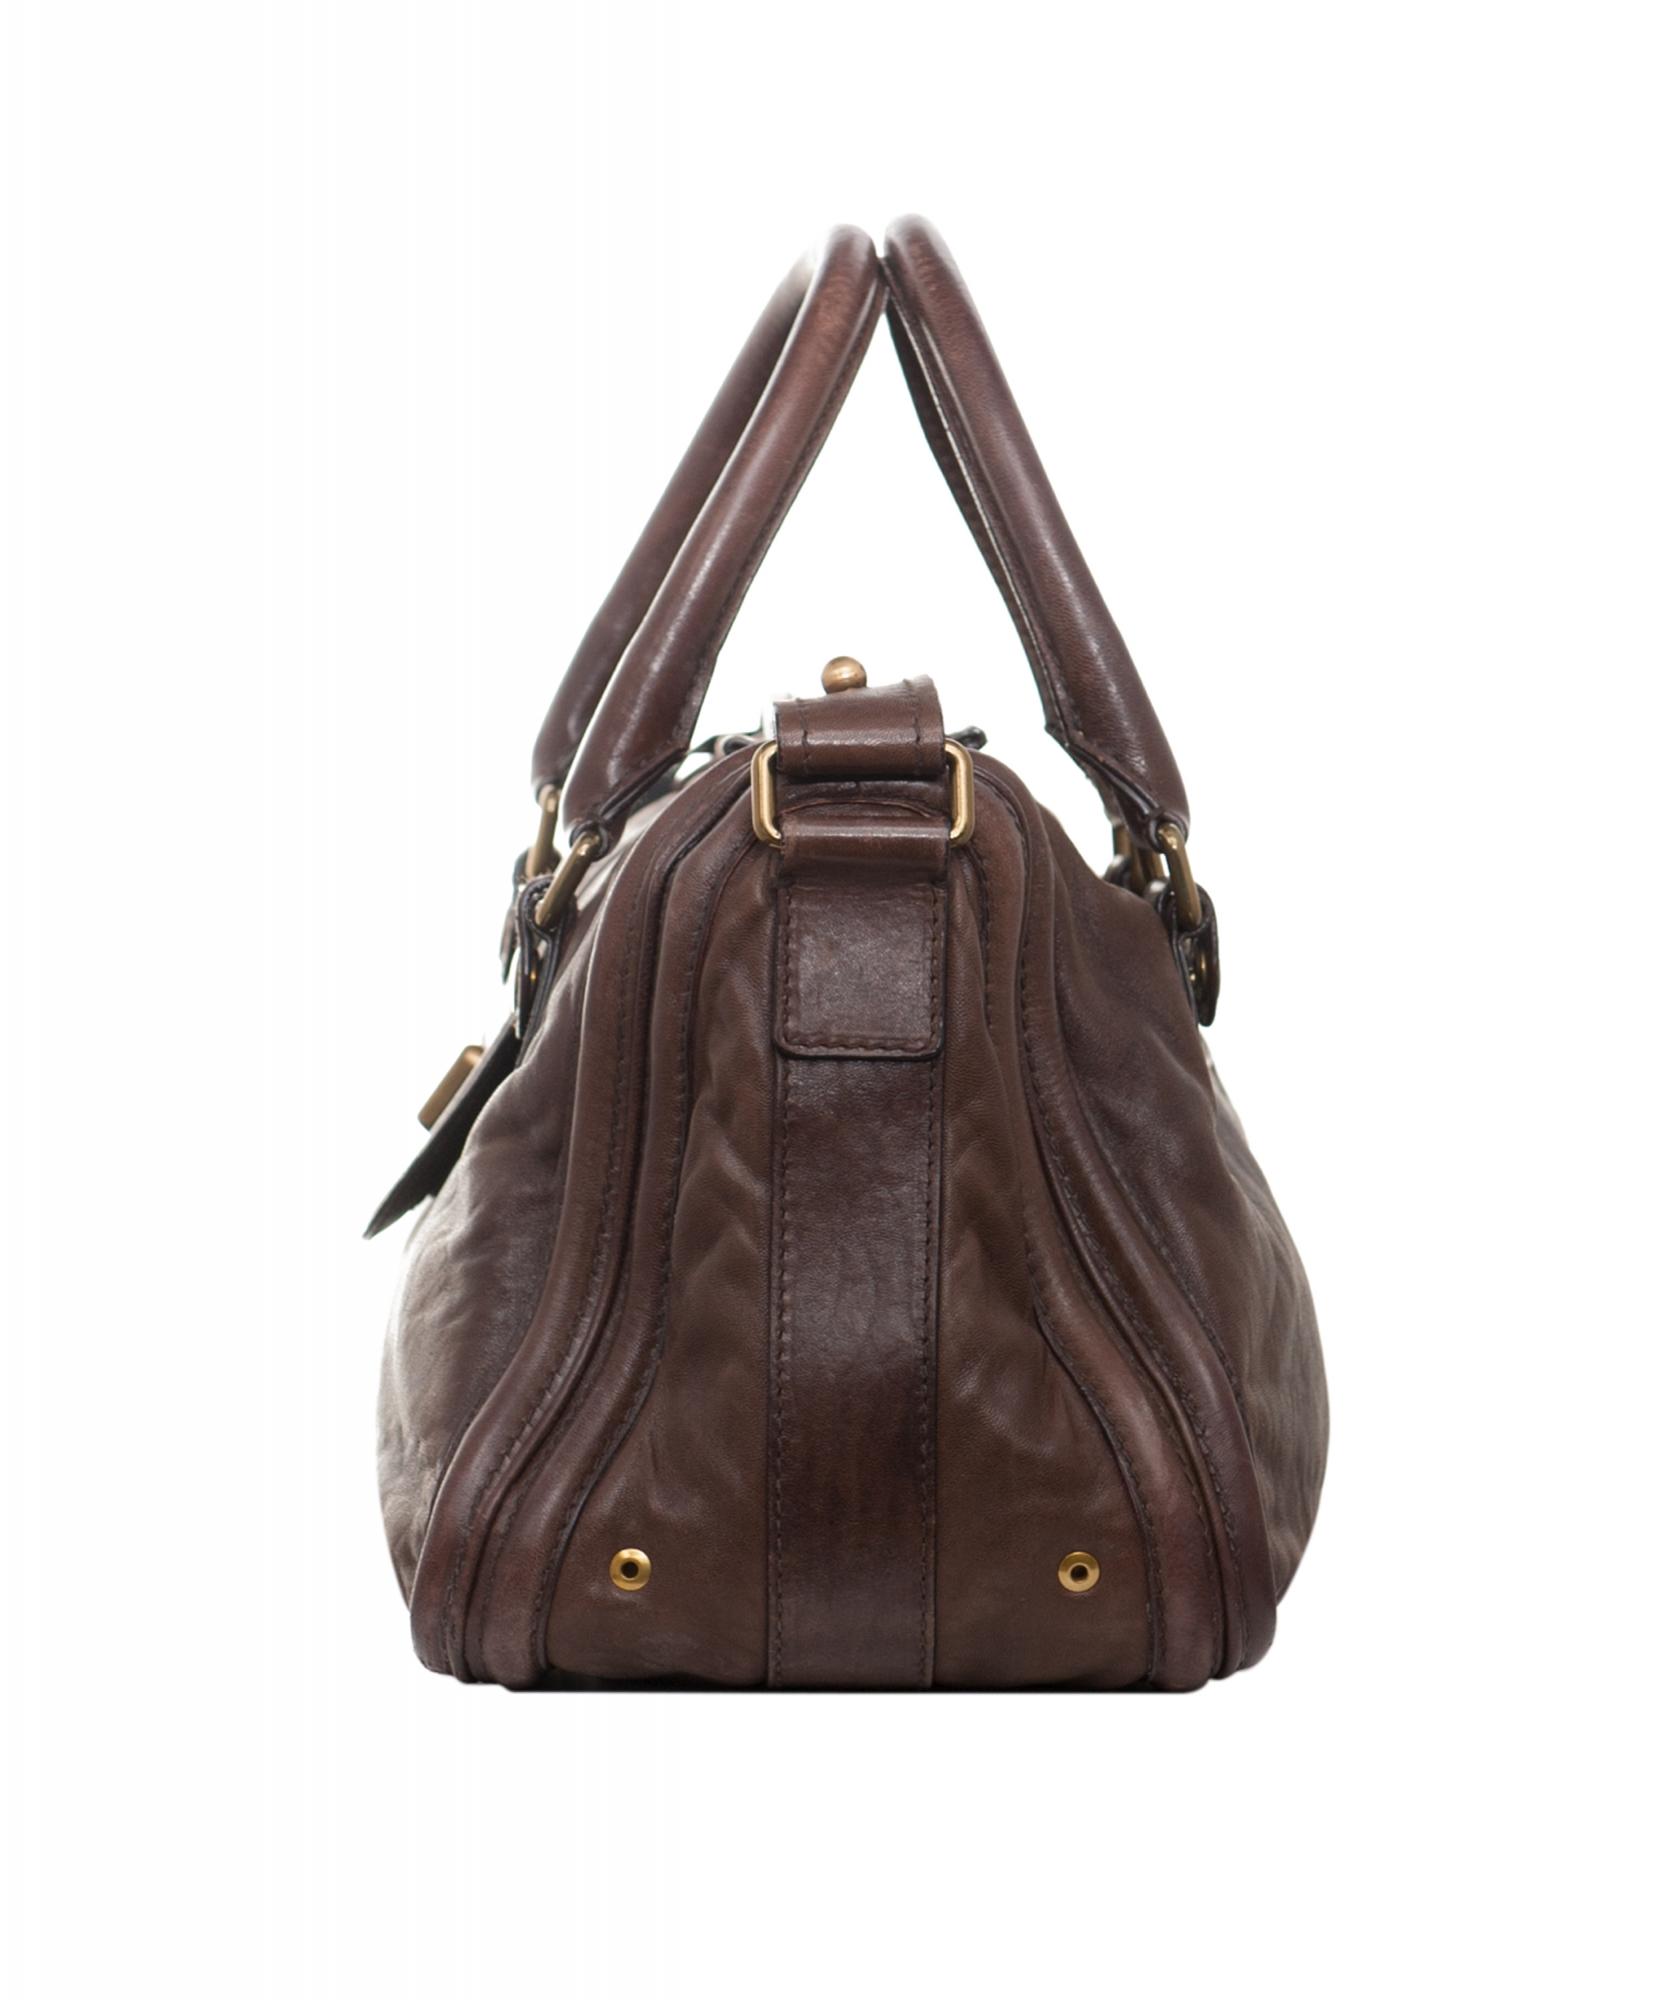 9a3d81807c4ea1 Chloé Brown Leather Ava Tote Bag | ArtListings